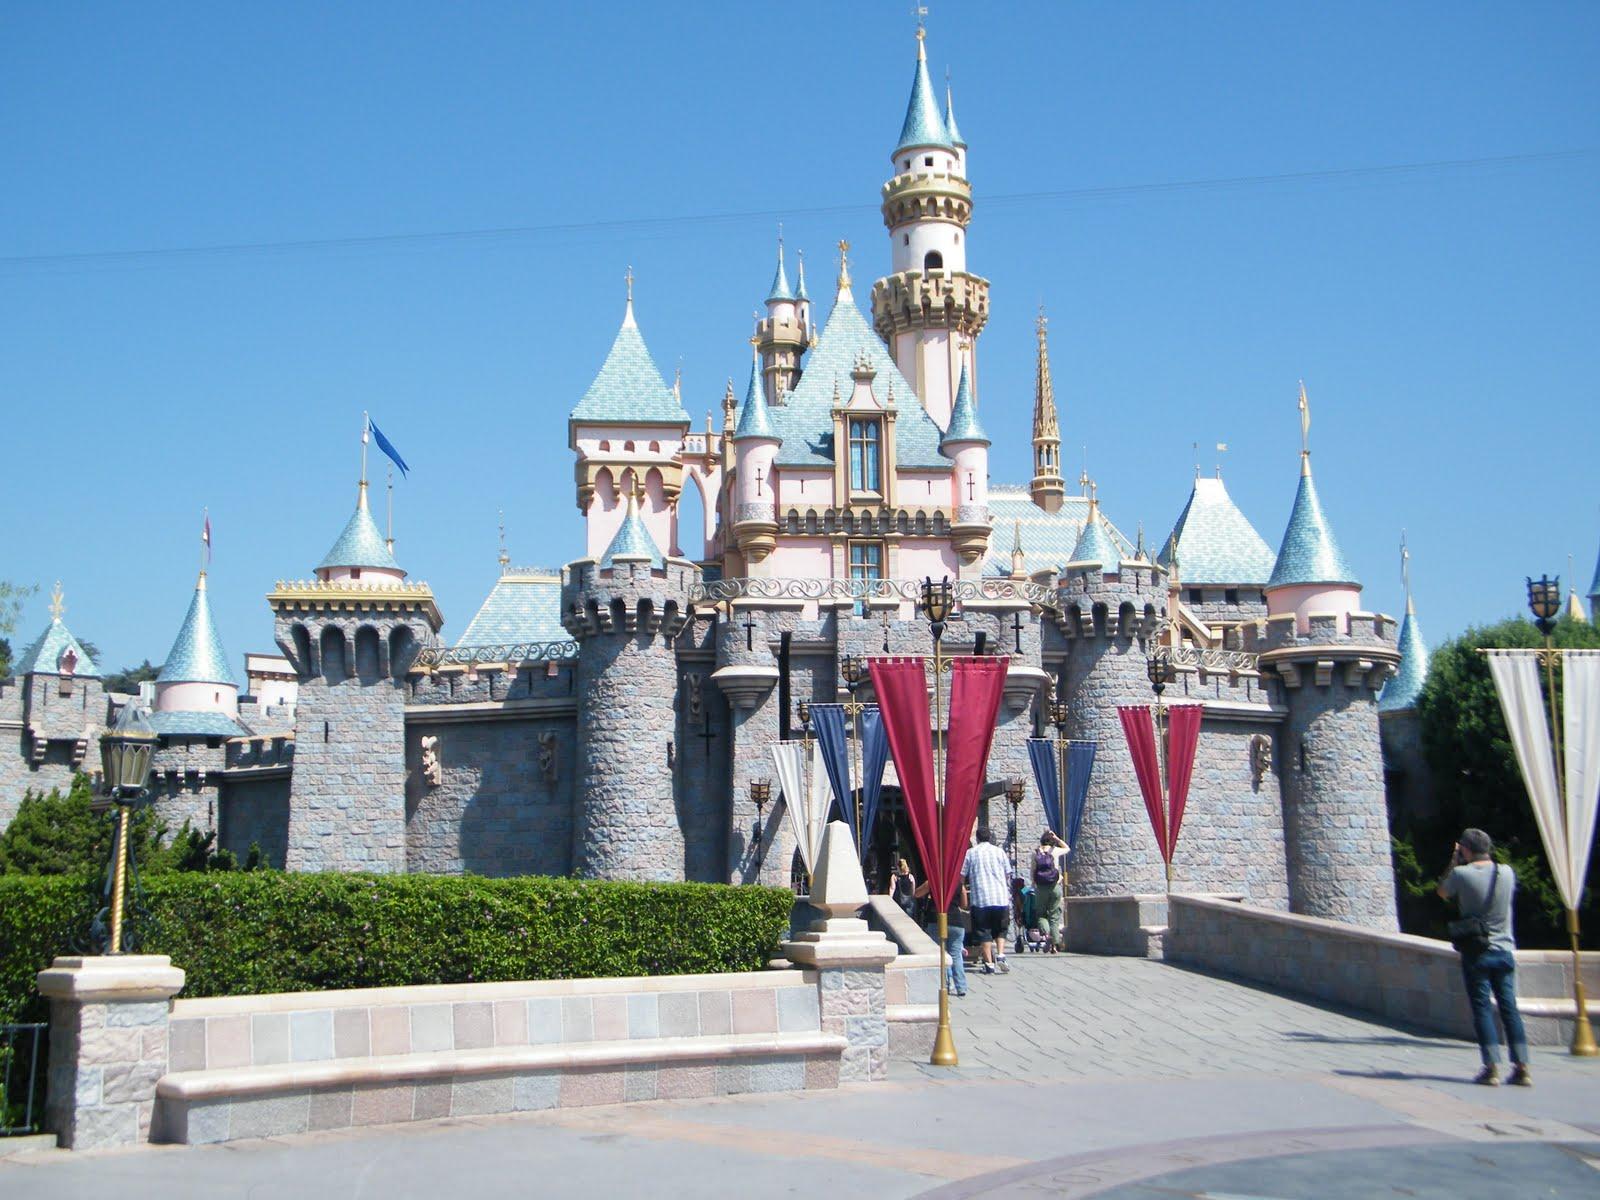 Bazza's Blog: California - Disneyland